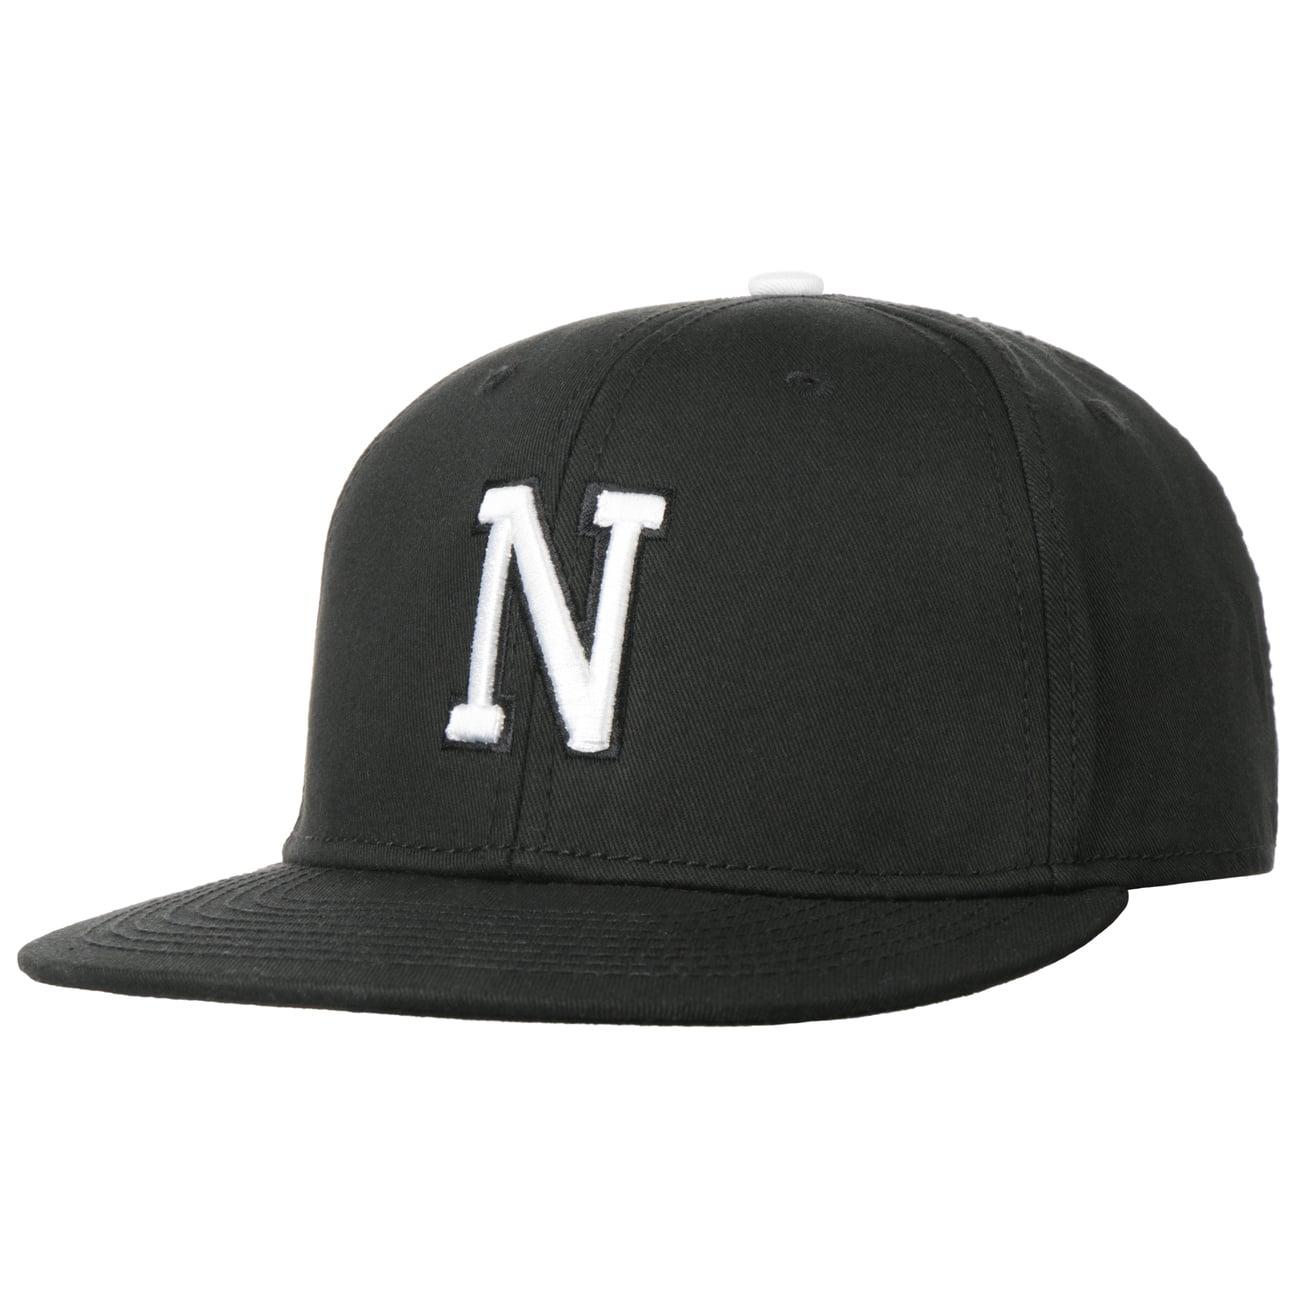 Casquette N Letter Snapback Cap  casquette de baseball